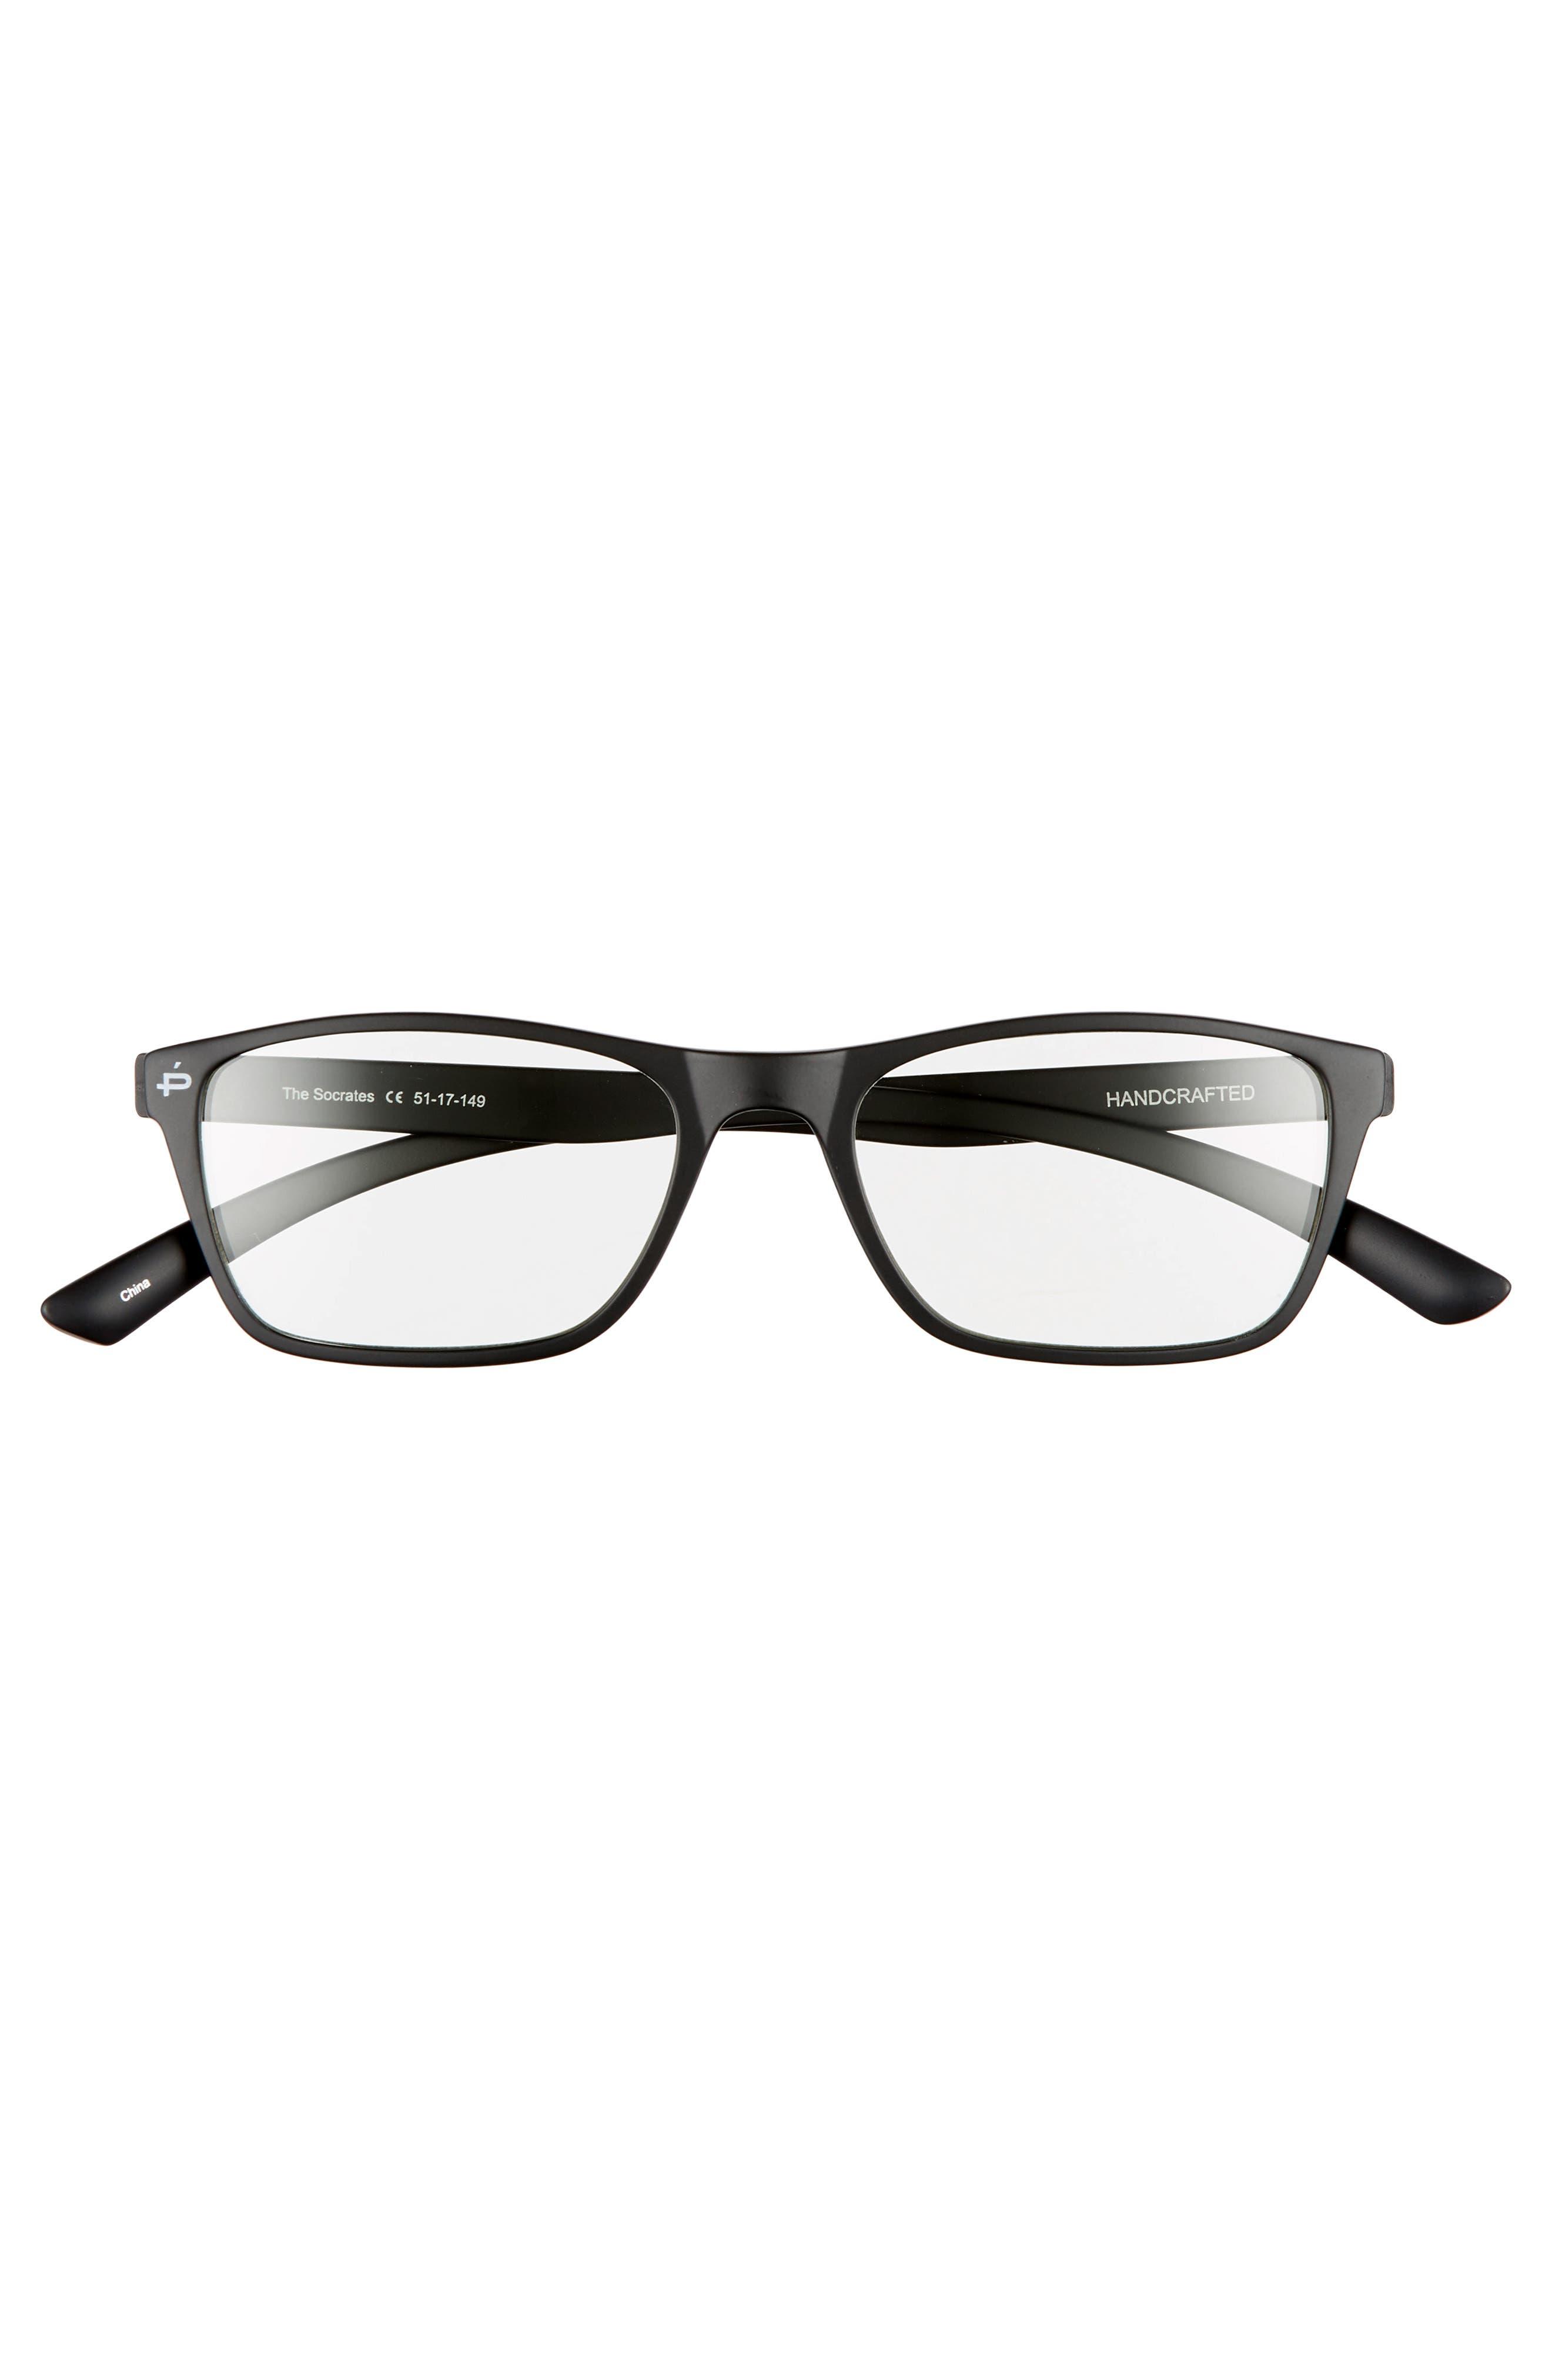 PRIVÉ REVAUX,                             The Socrates 51mm Blue Light Blocking Glasses,                             Alternate thumbnail 3, color,                             001